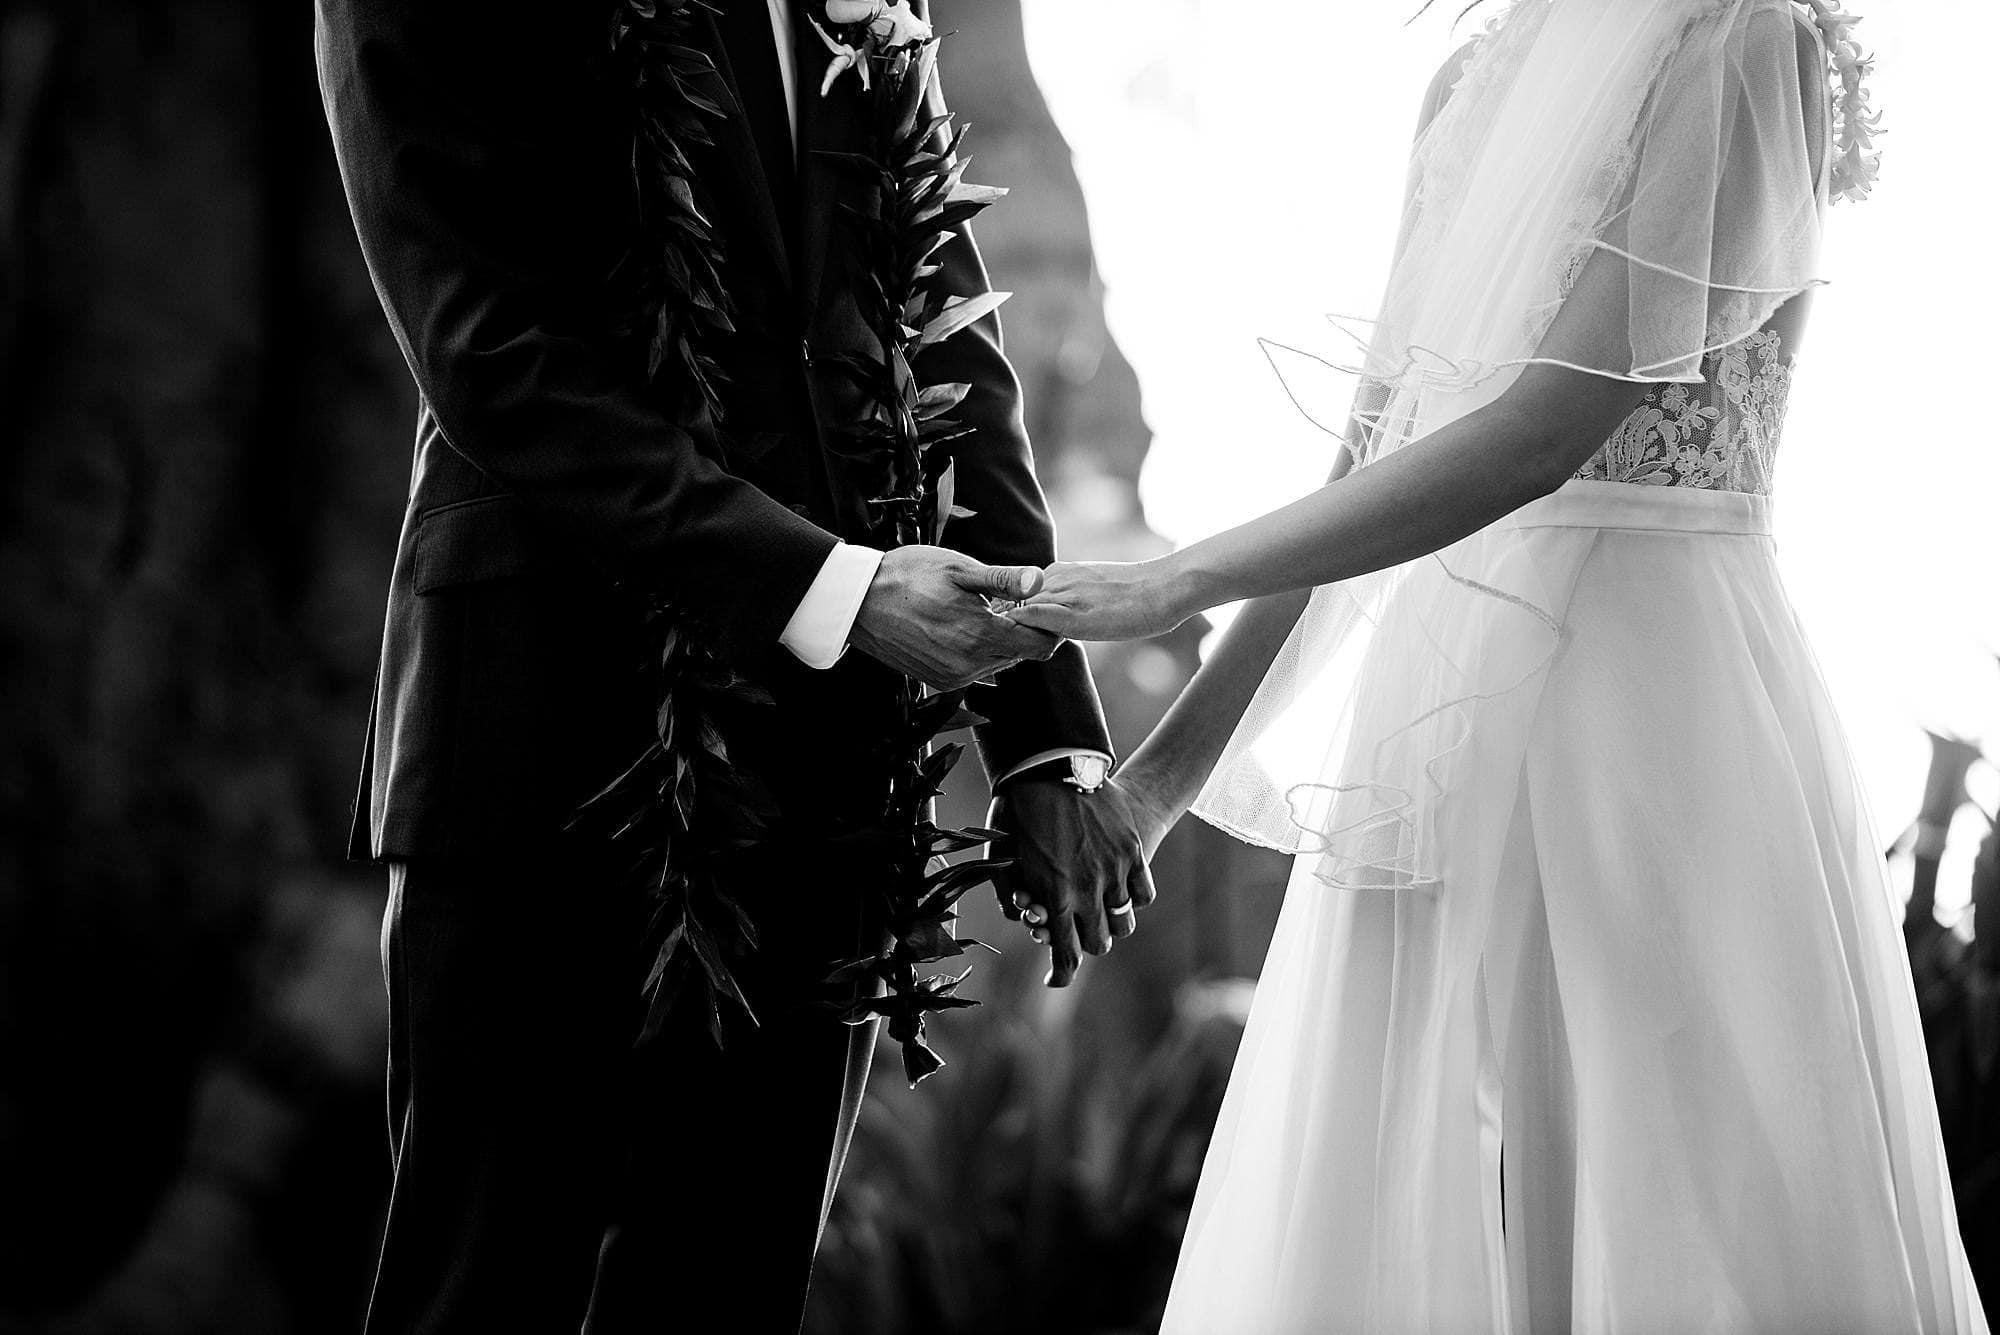 groom holding bride's hand at Olowalu Plantation House